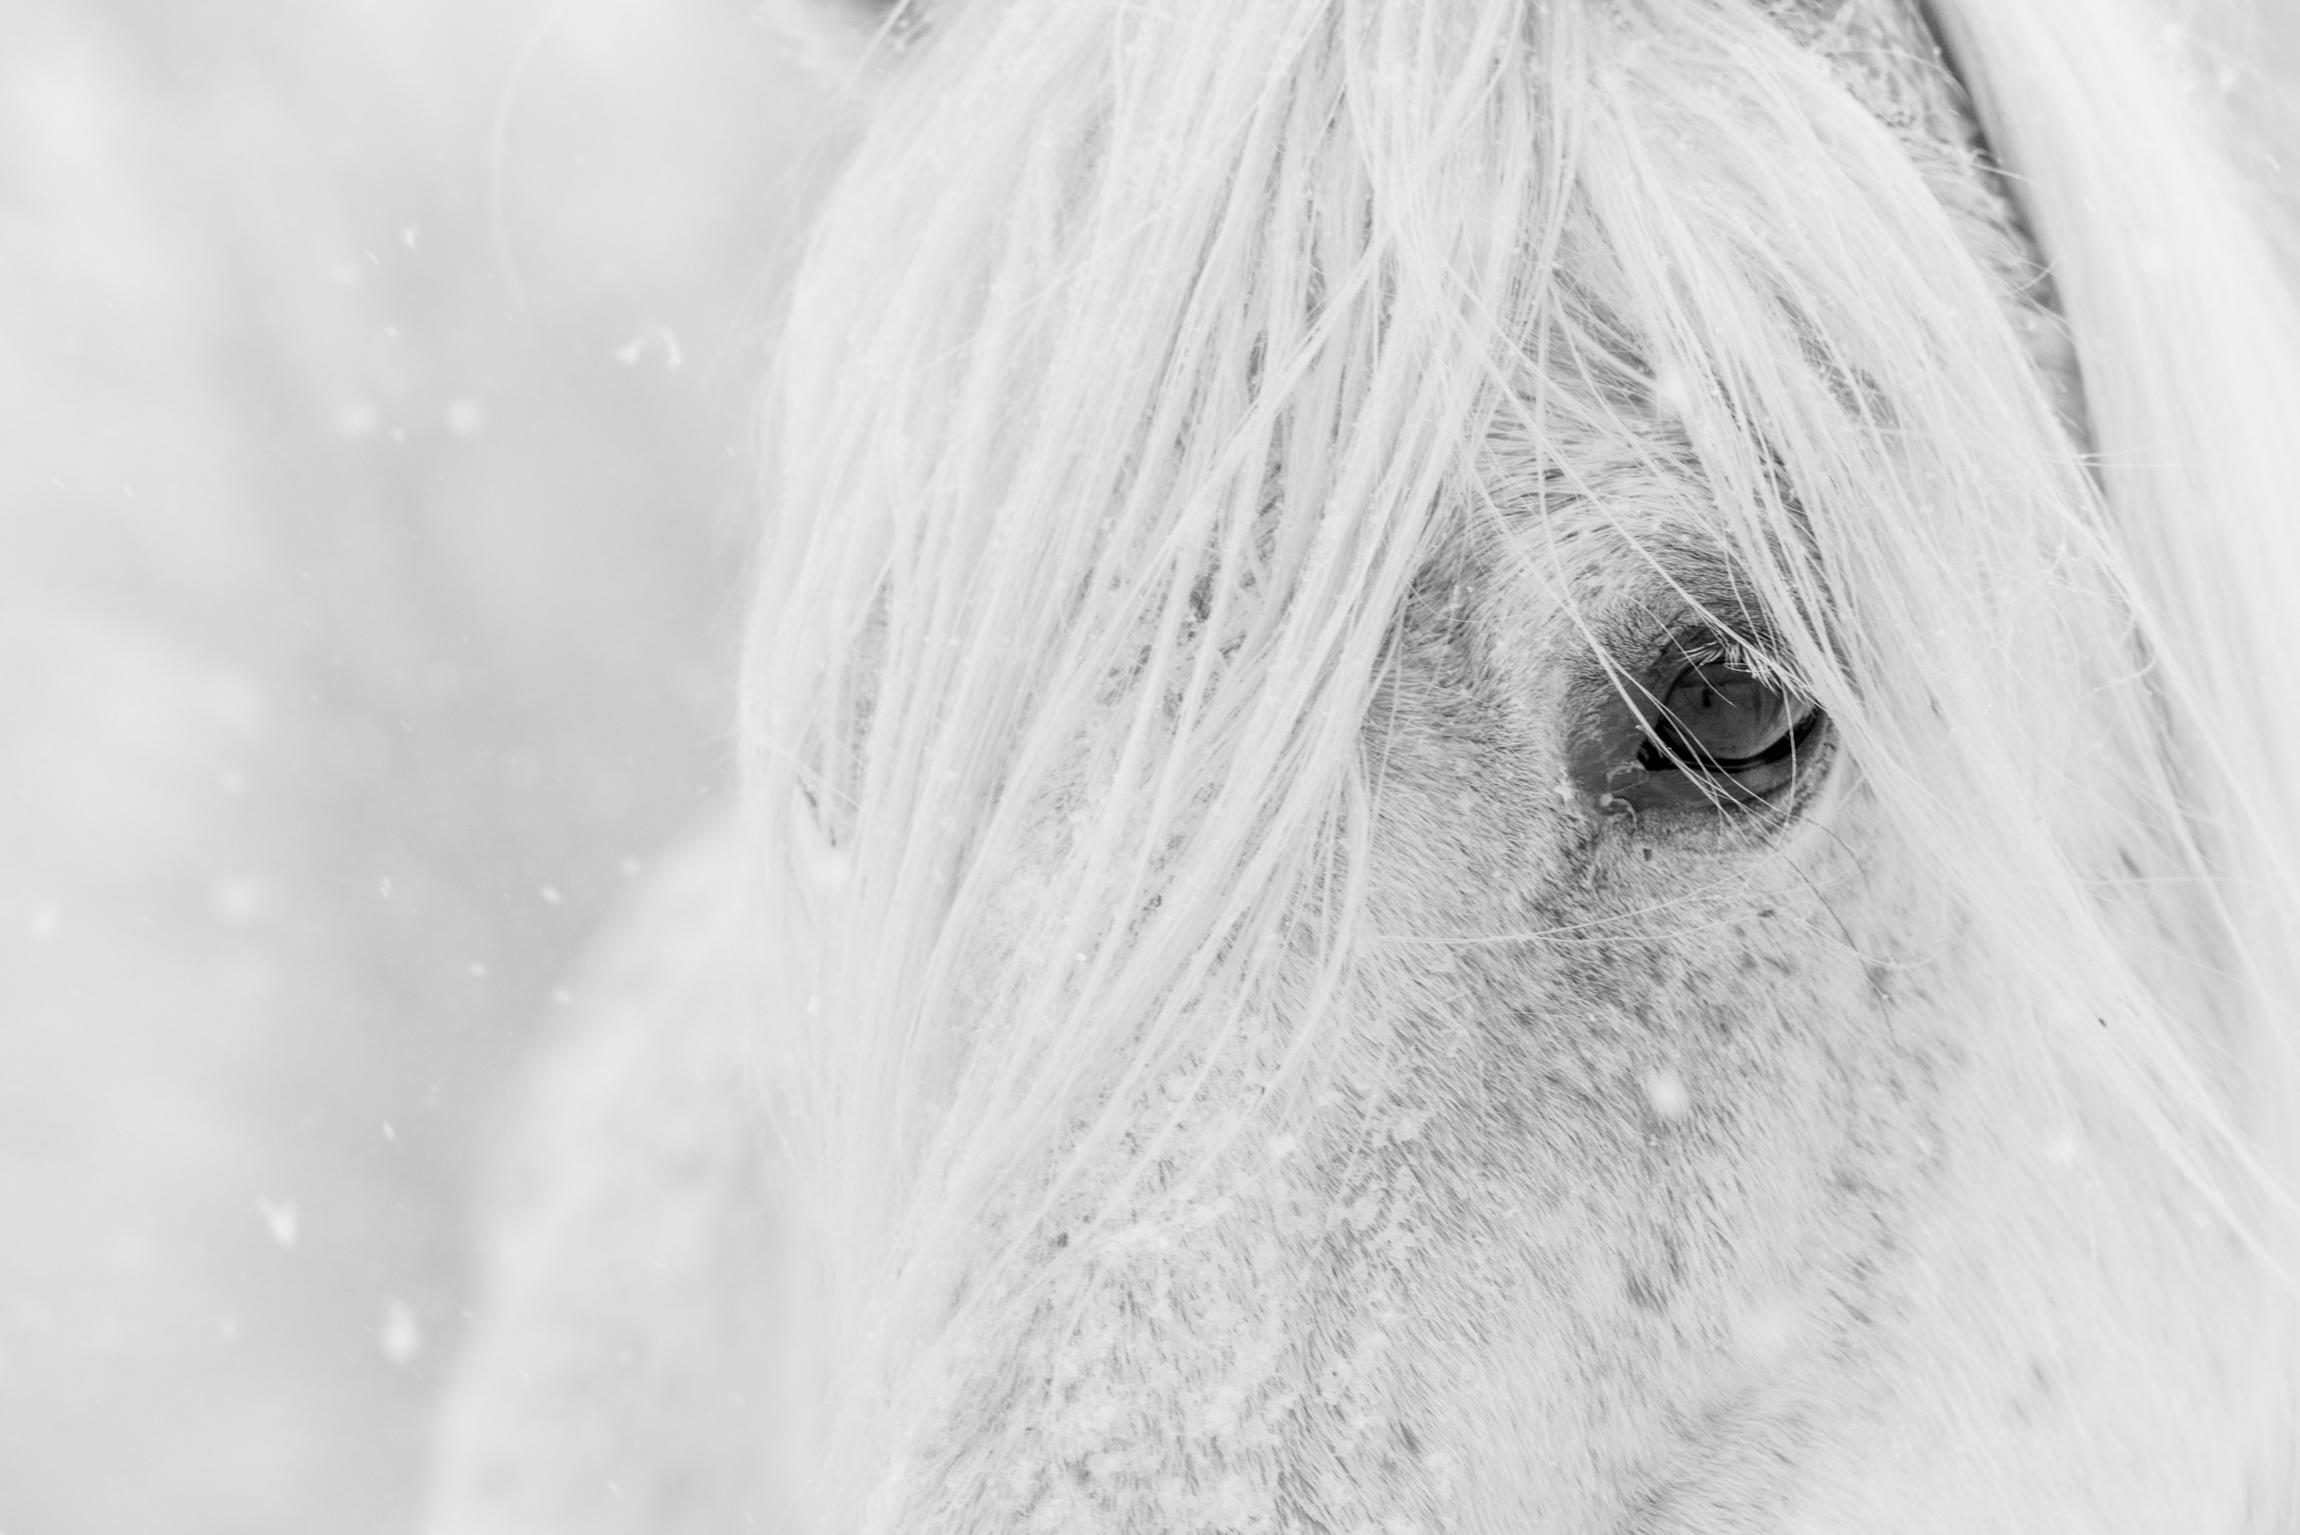 Snow Glance